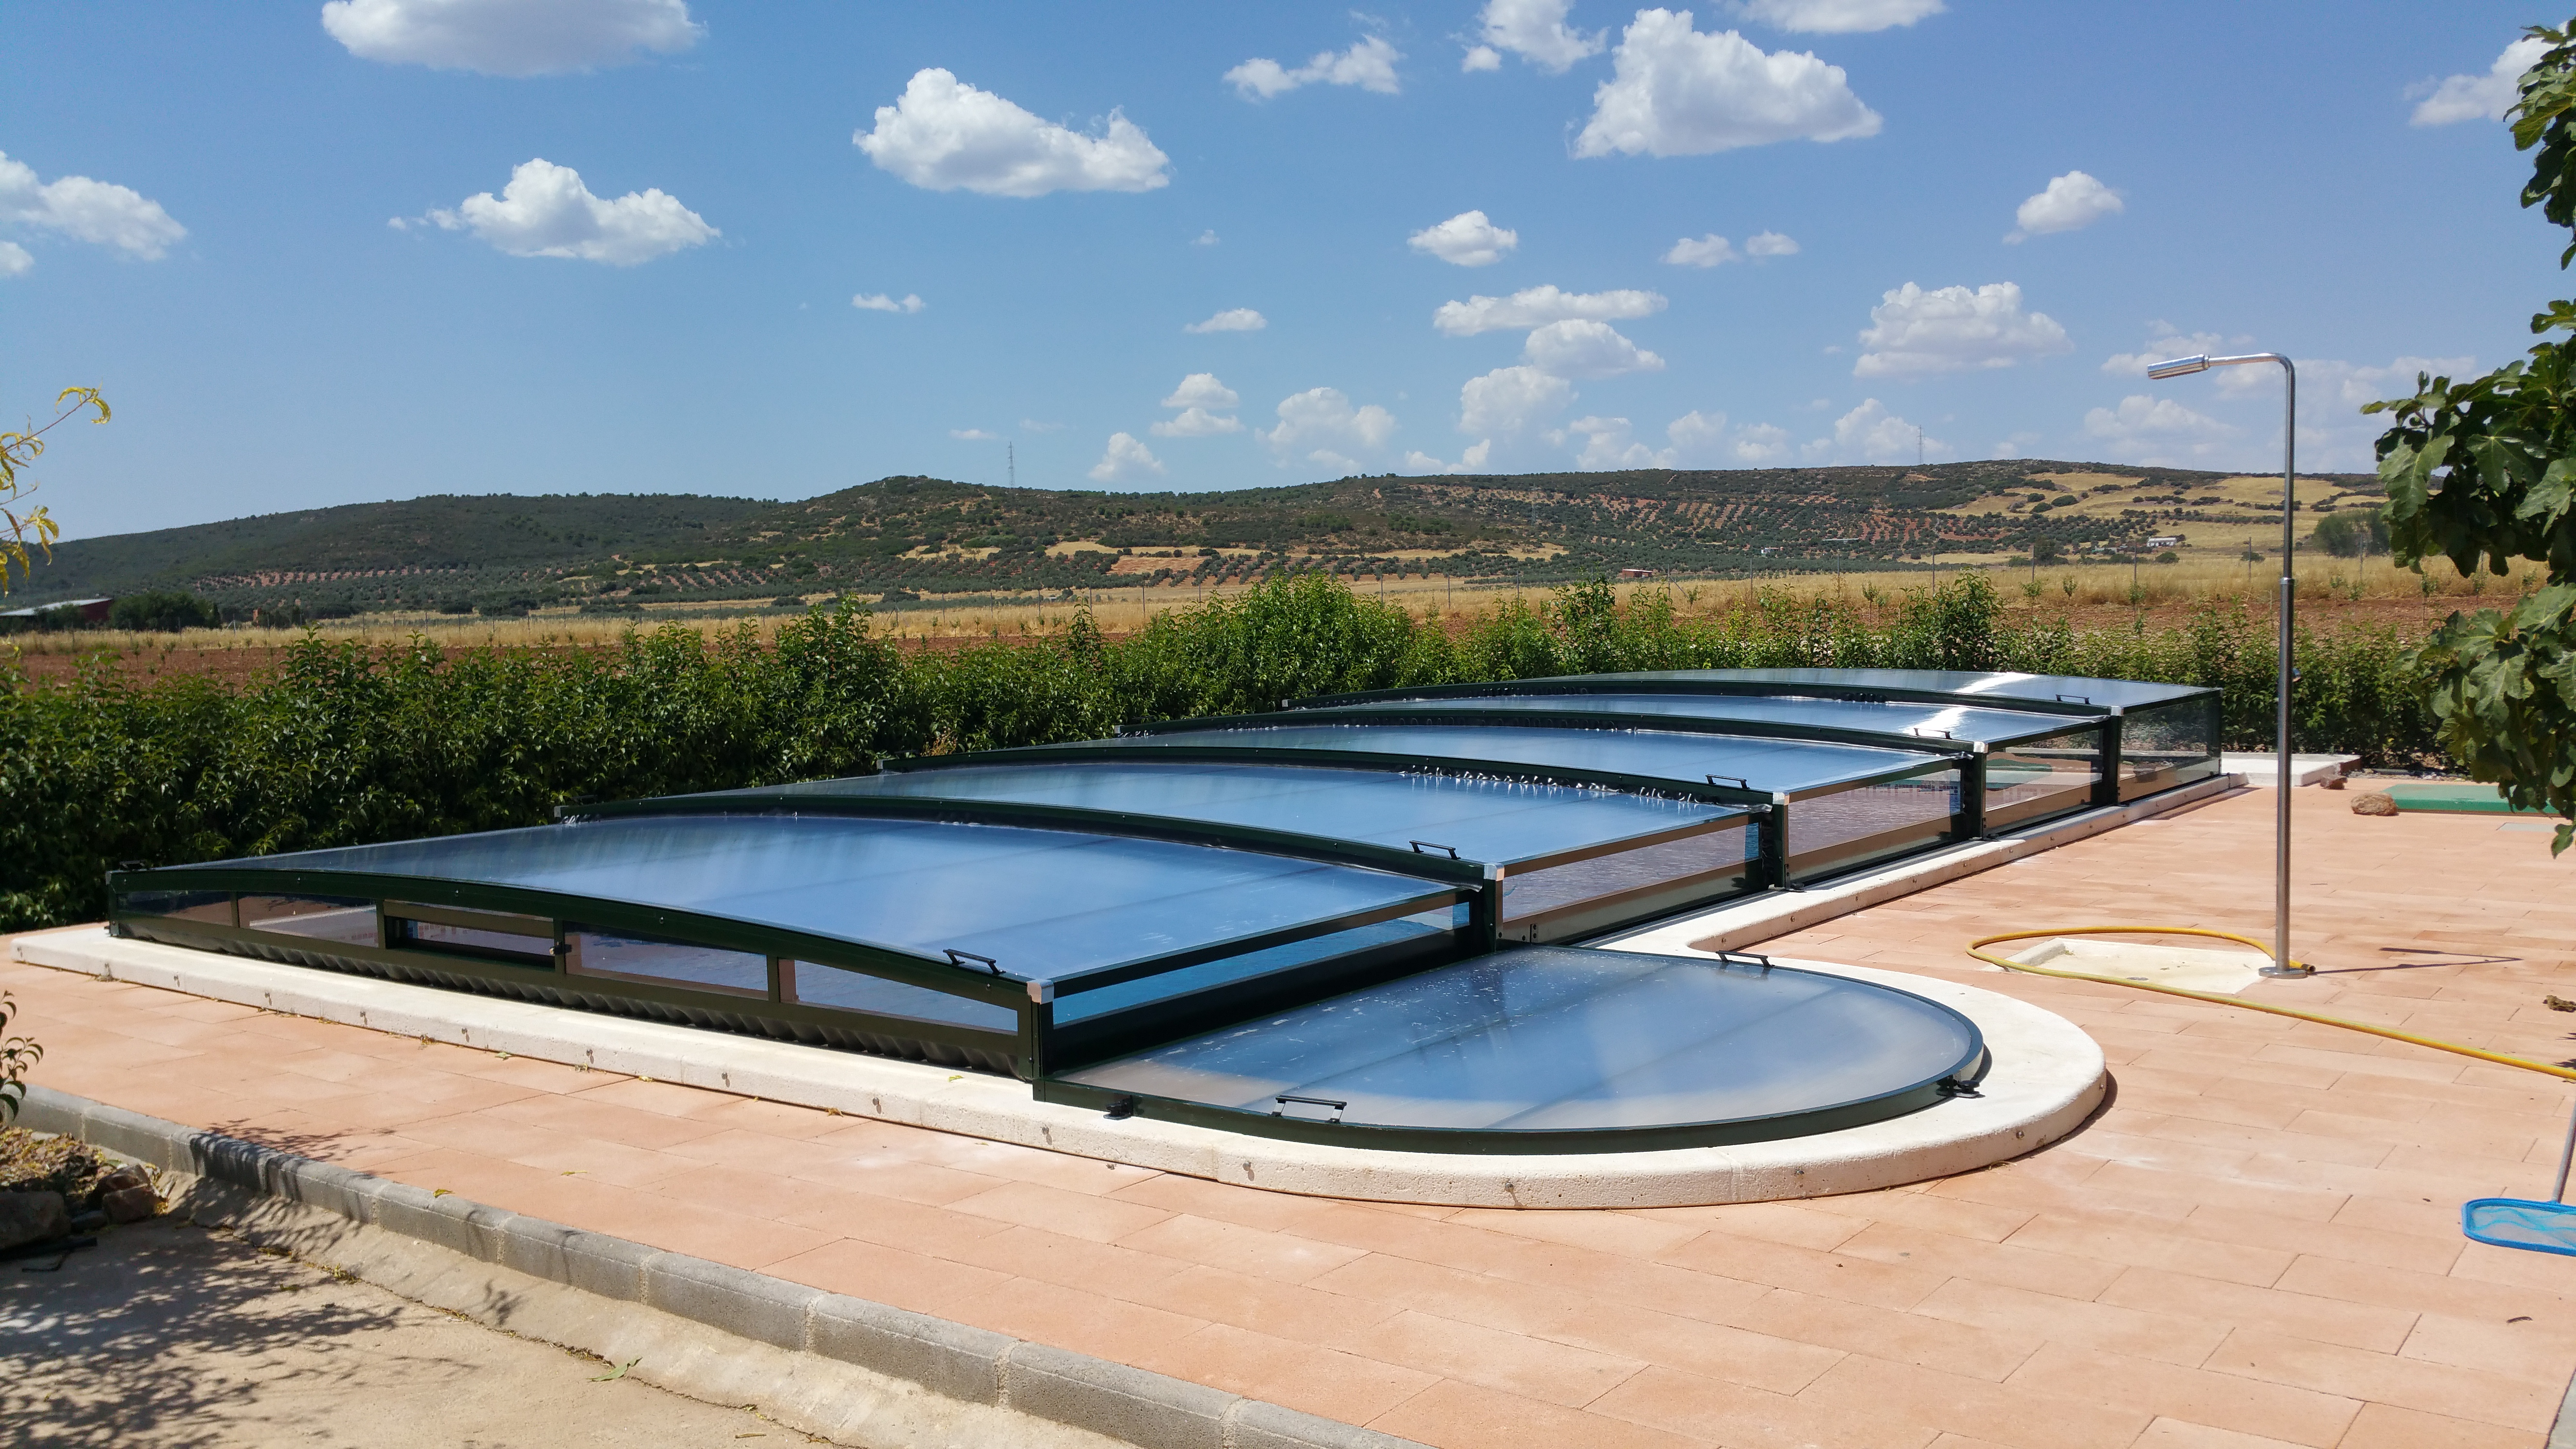 Cubierta elevada telescópica piscina Atenea